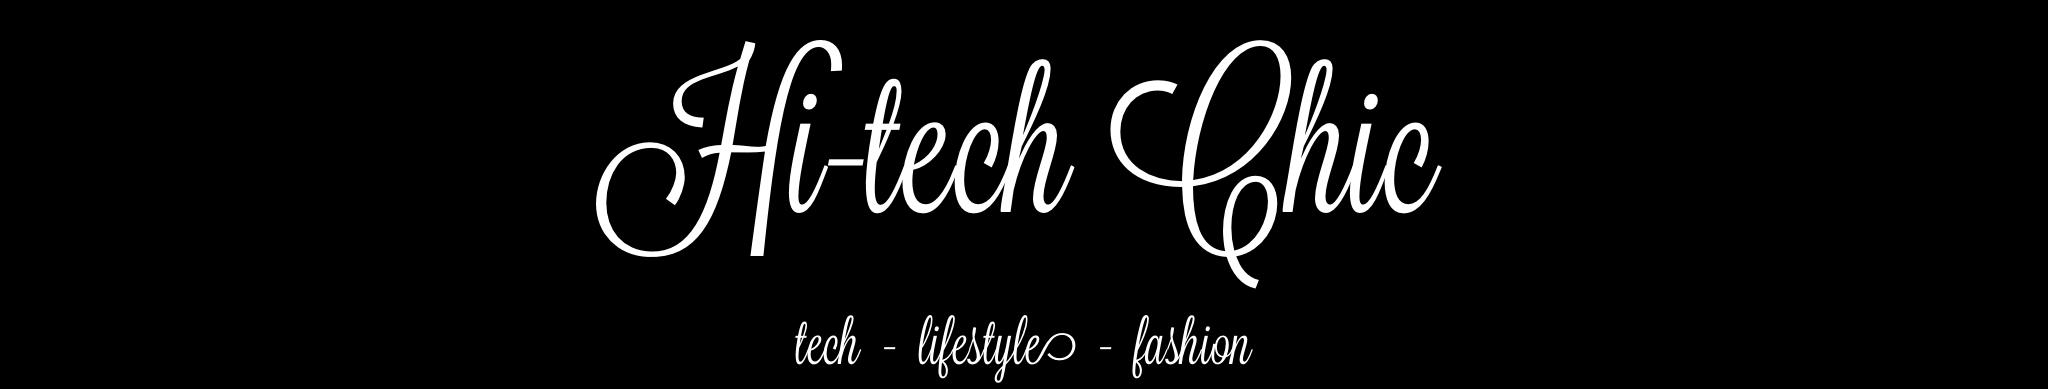 cropped-HTC-Black-Logo-title-1.png